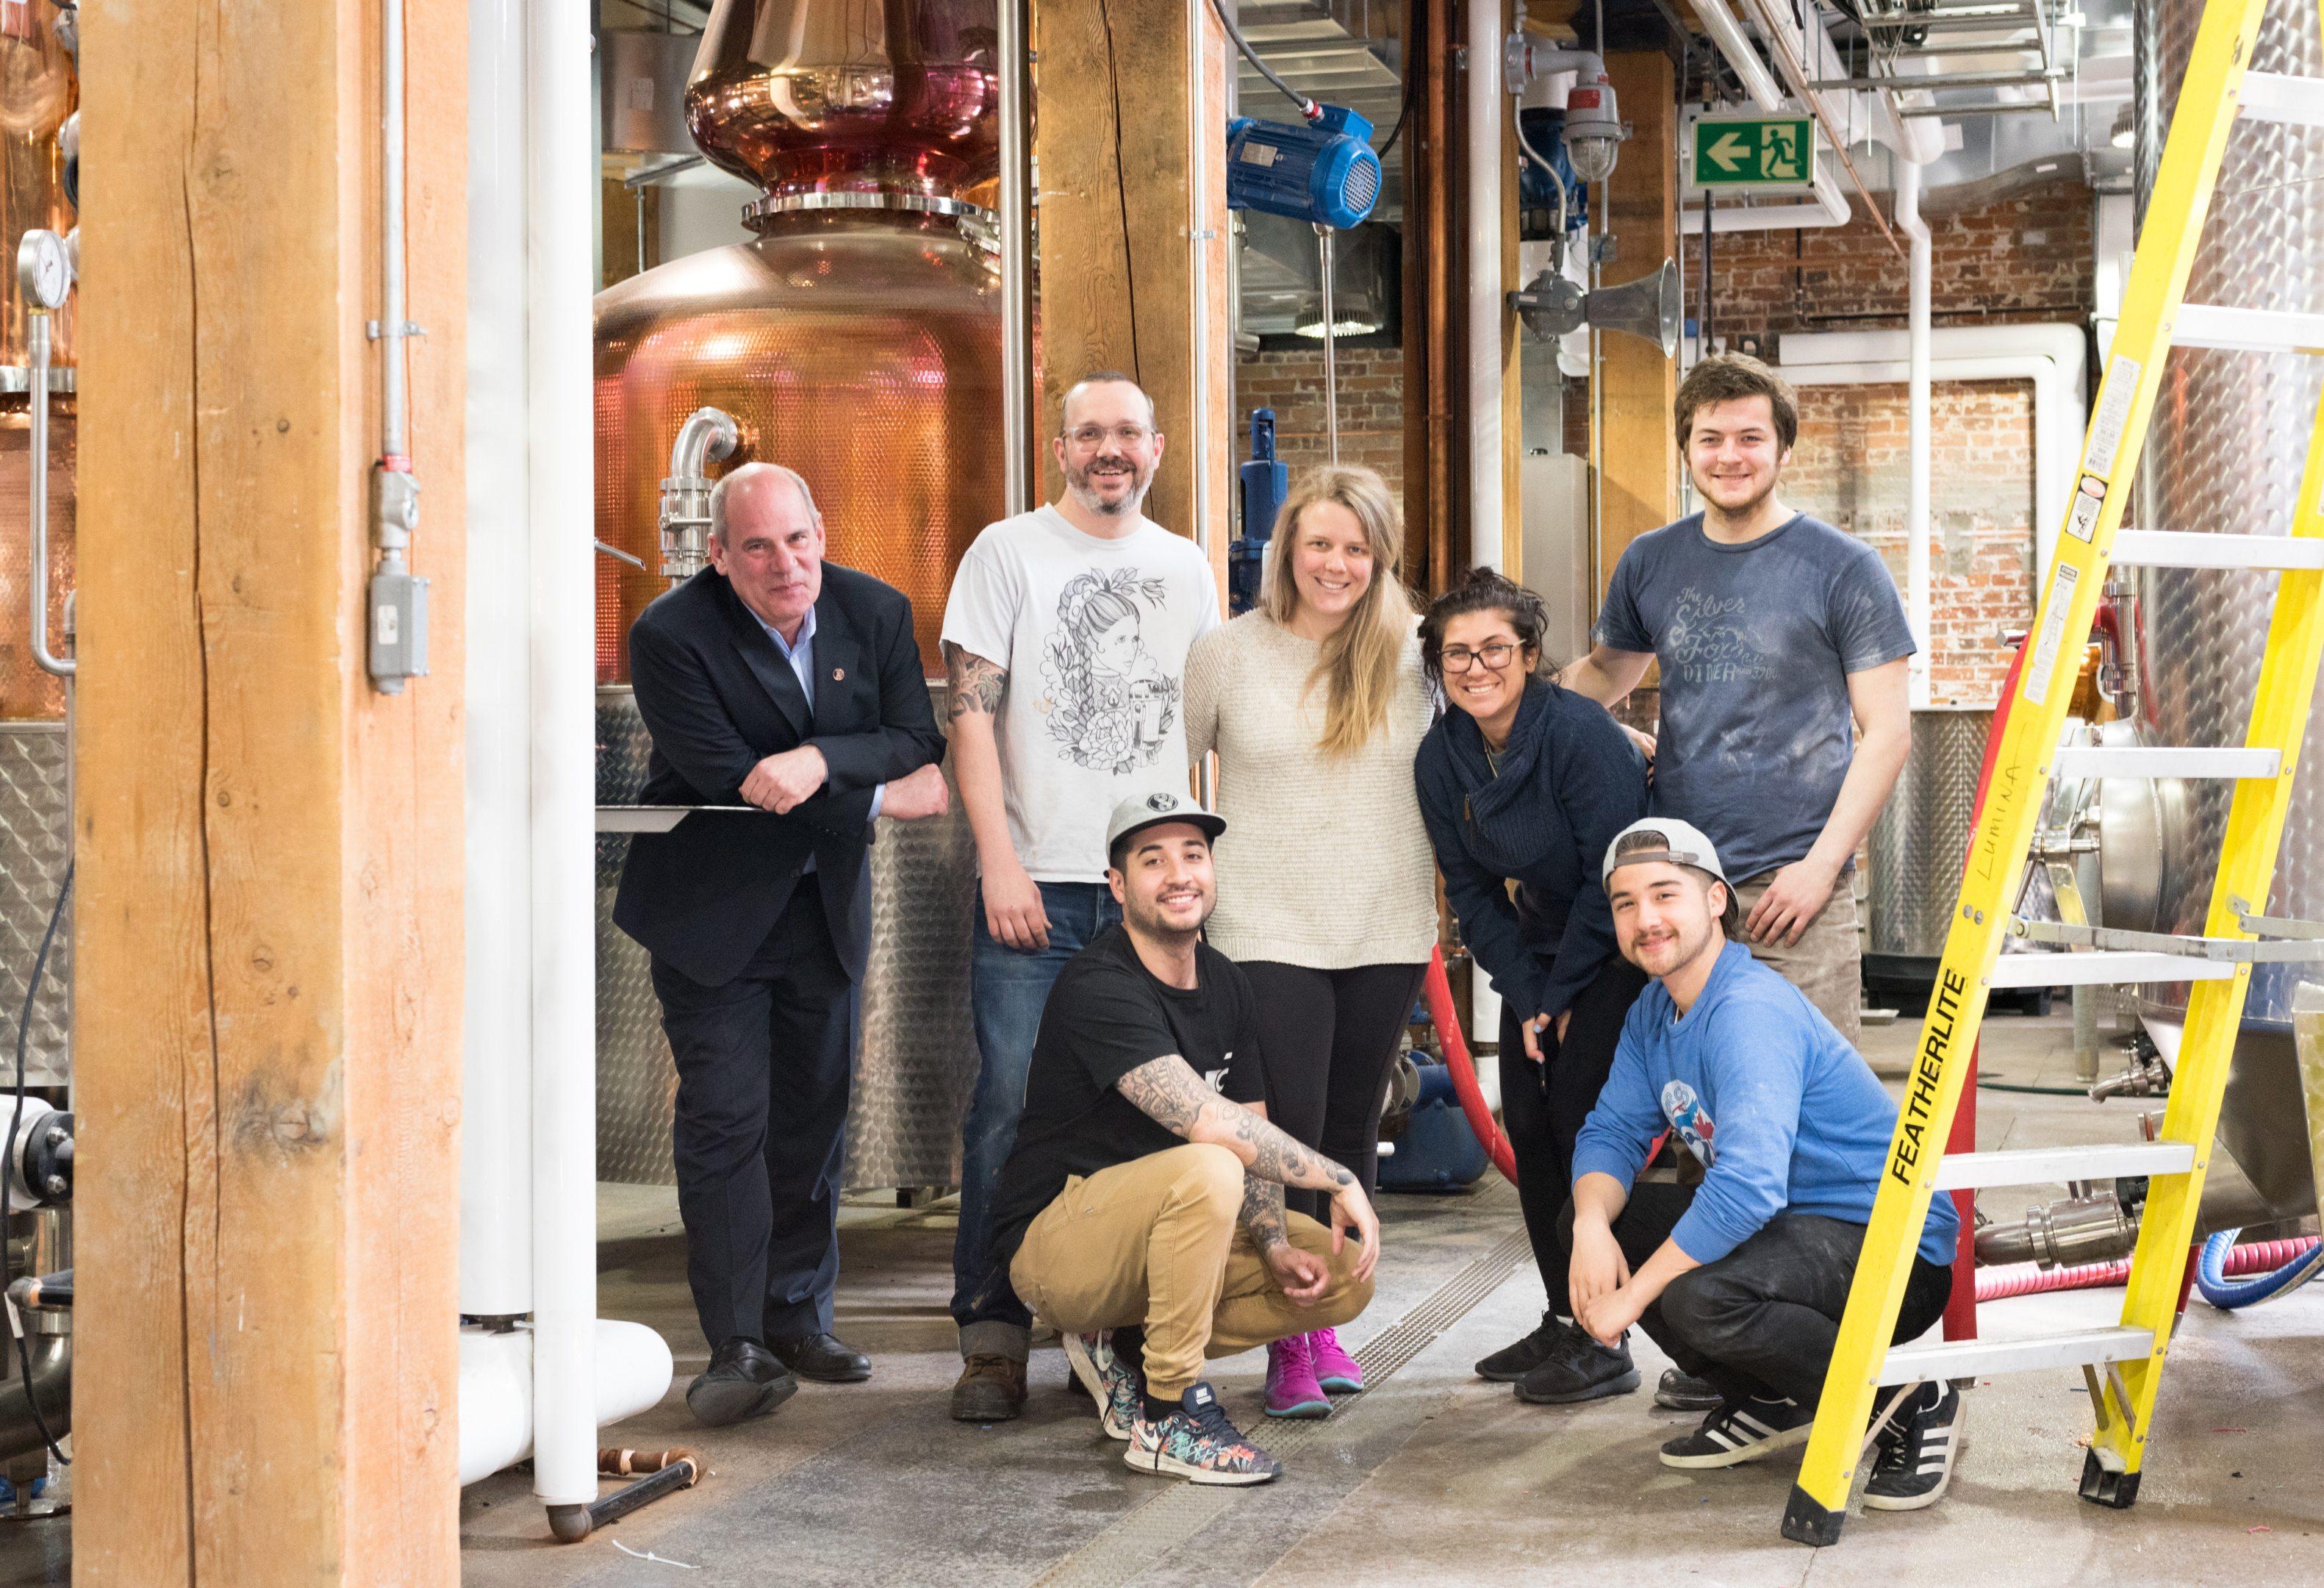 toronto-bars-spirit-of-york-distillery-co-distillery-district-team